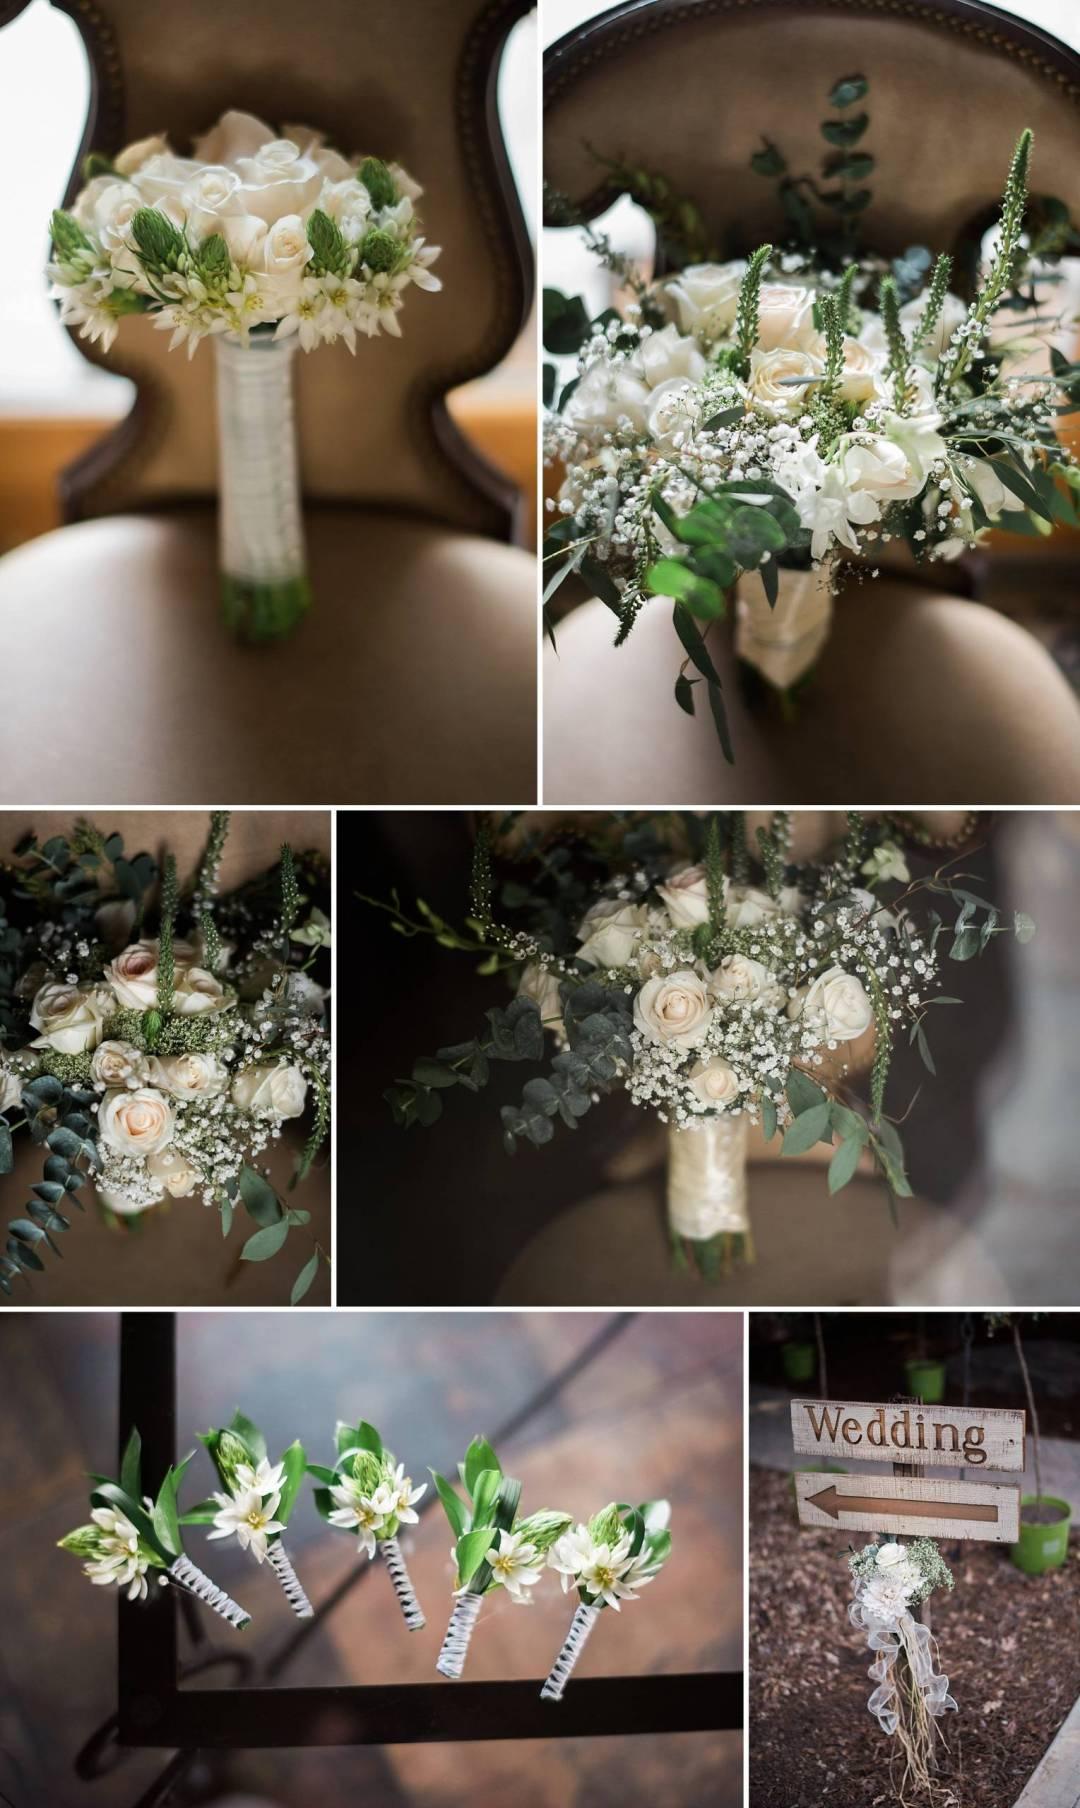 Erin + Marcel Third Element Photography & Cinema Fresno County Estate Wedding Hybrid Film Wedding Photographer_0023